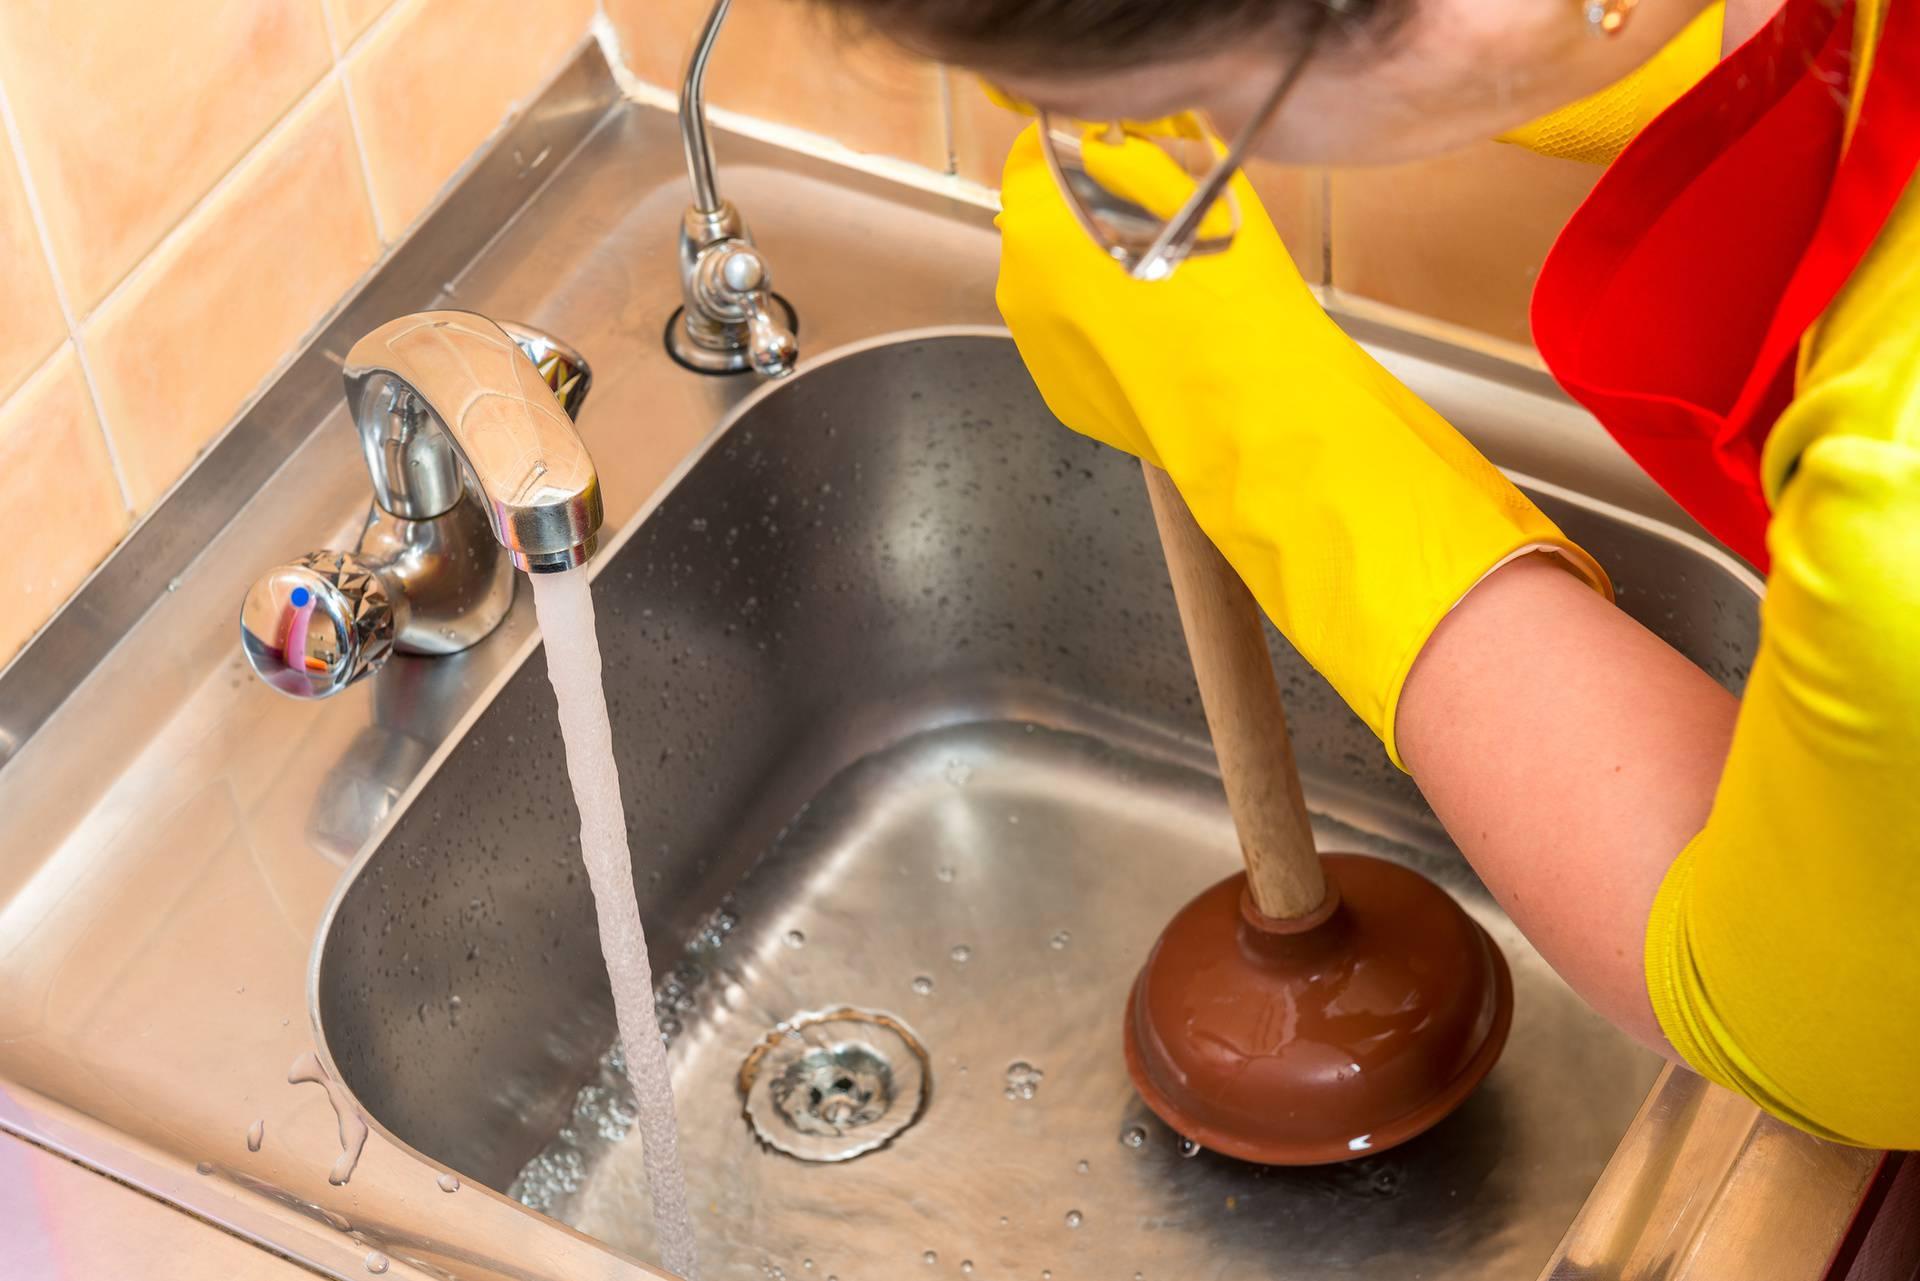 Sami odčepite odvod i uklonite neugodne mirise u tri koraka